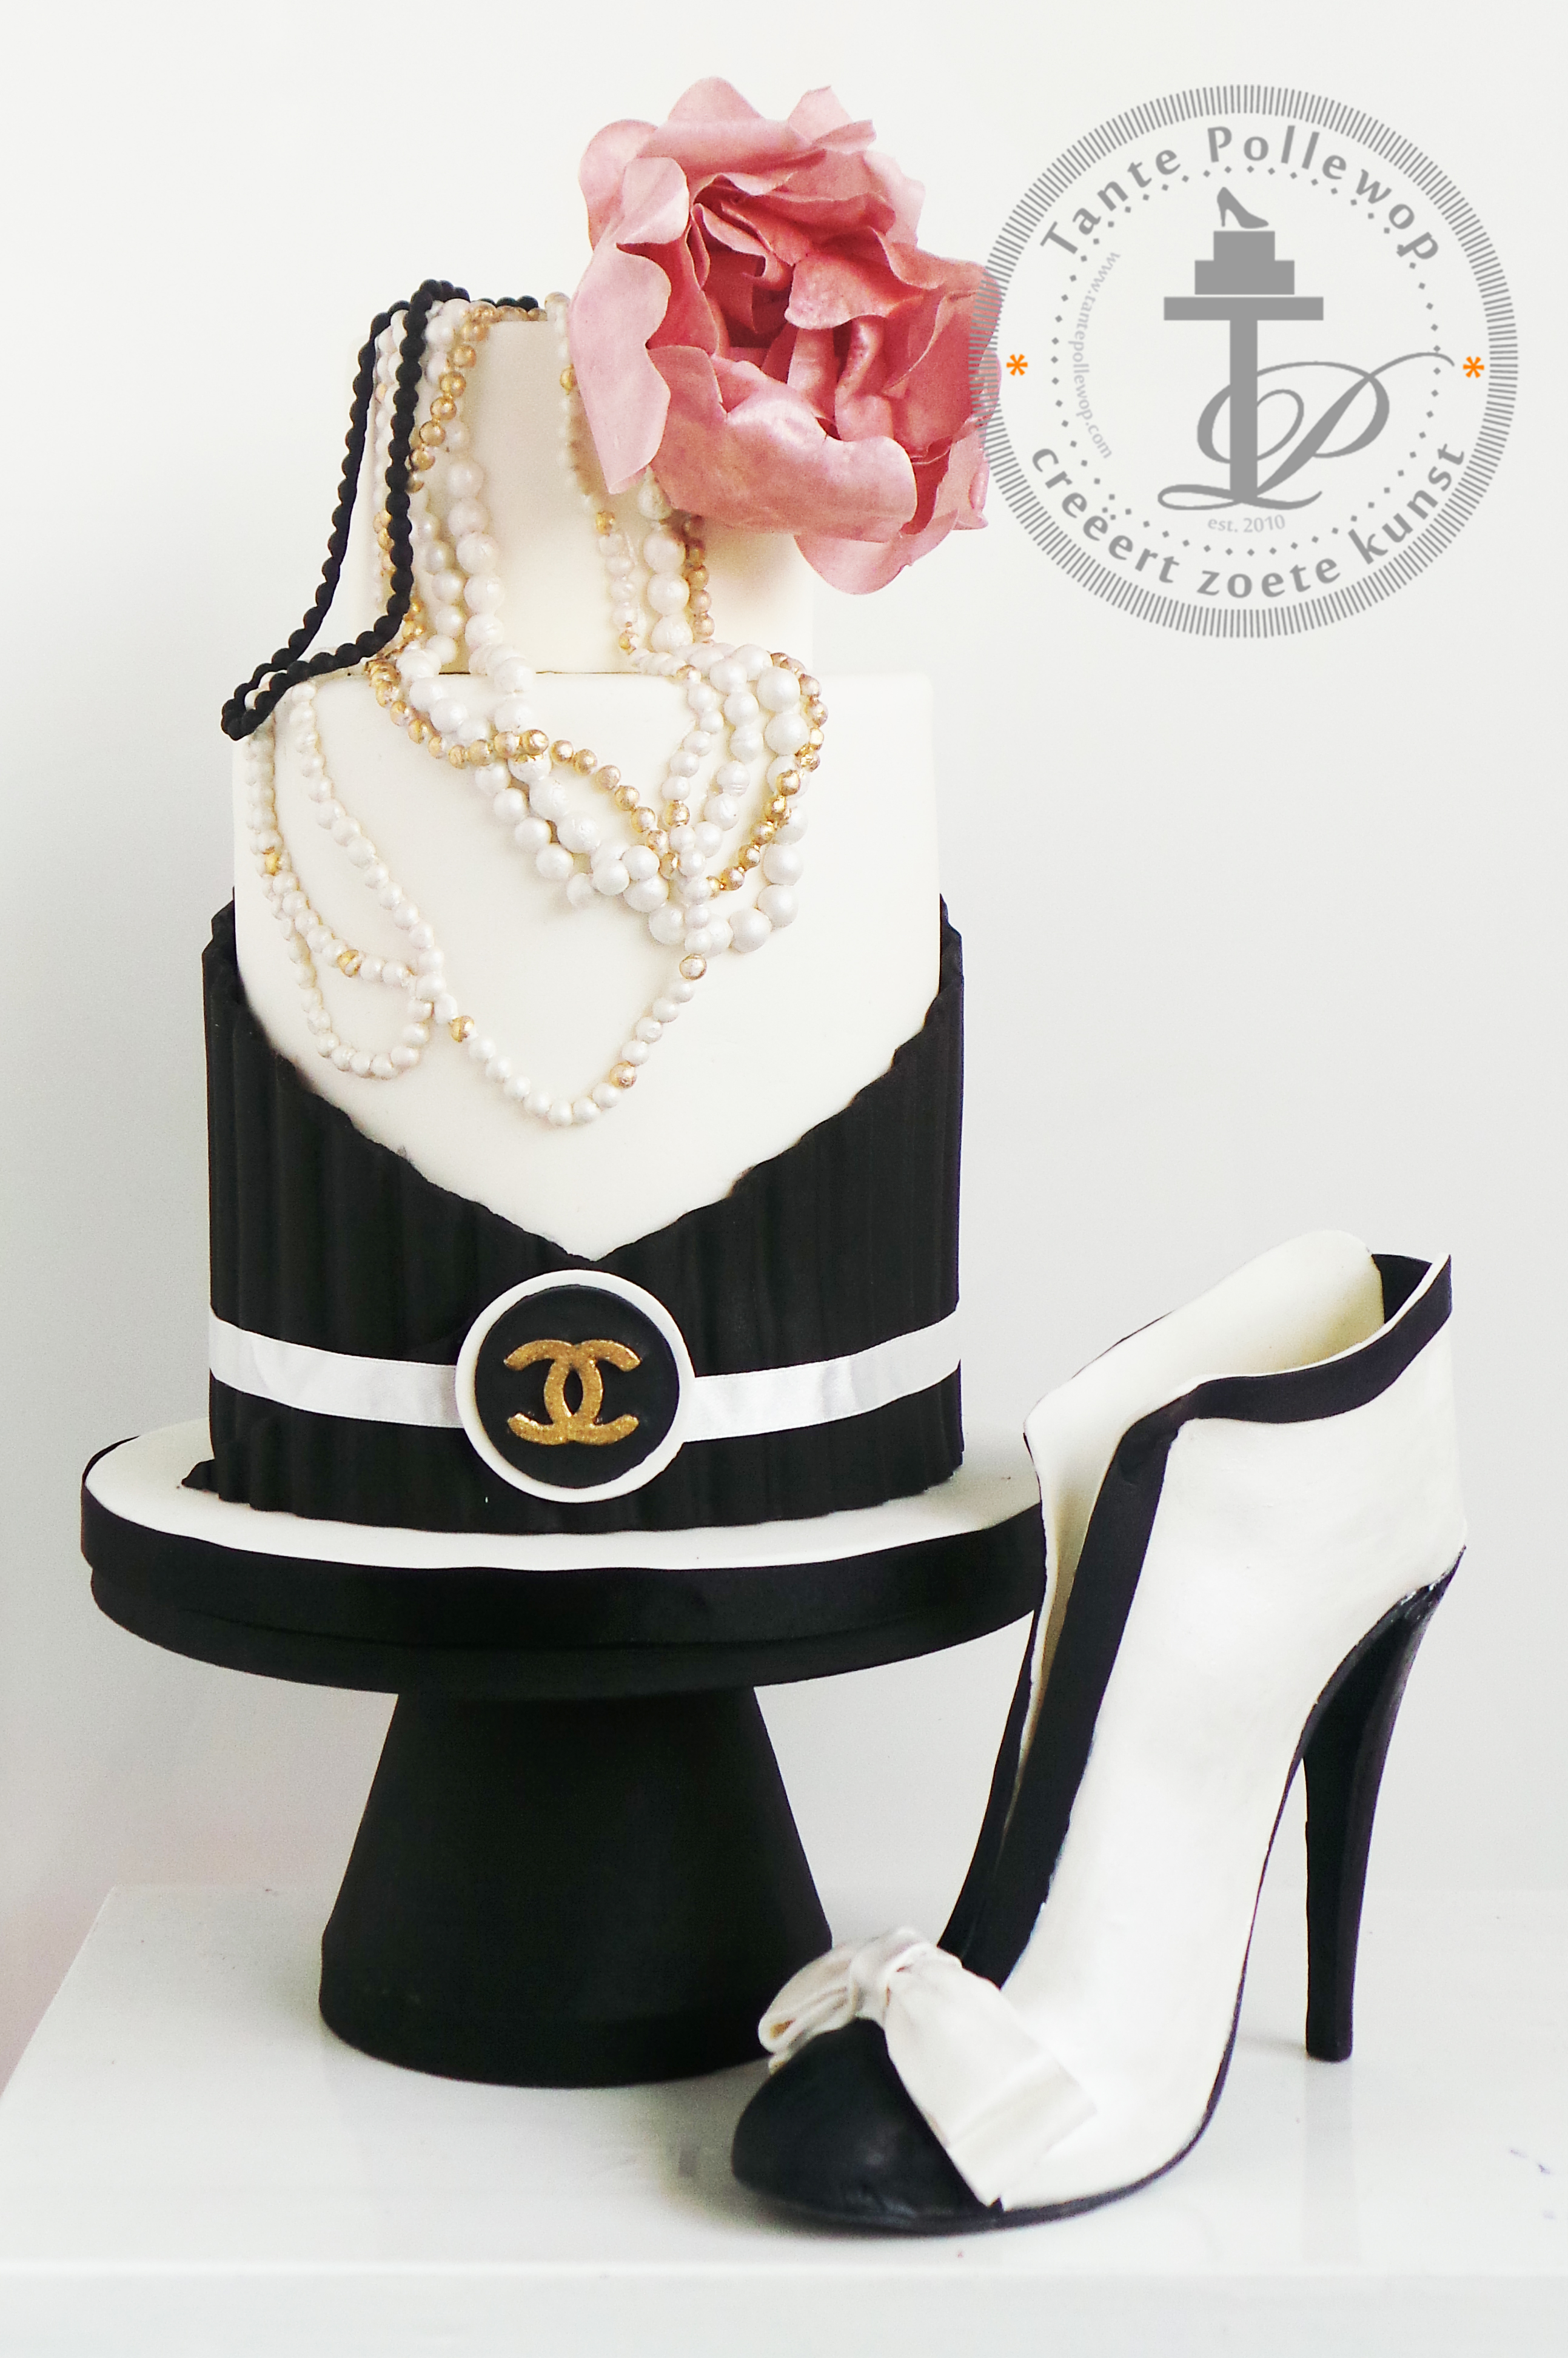 Tante Pollewop Cake Design | Chanel Cake including fondant shoe